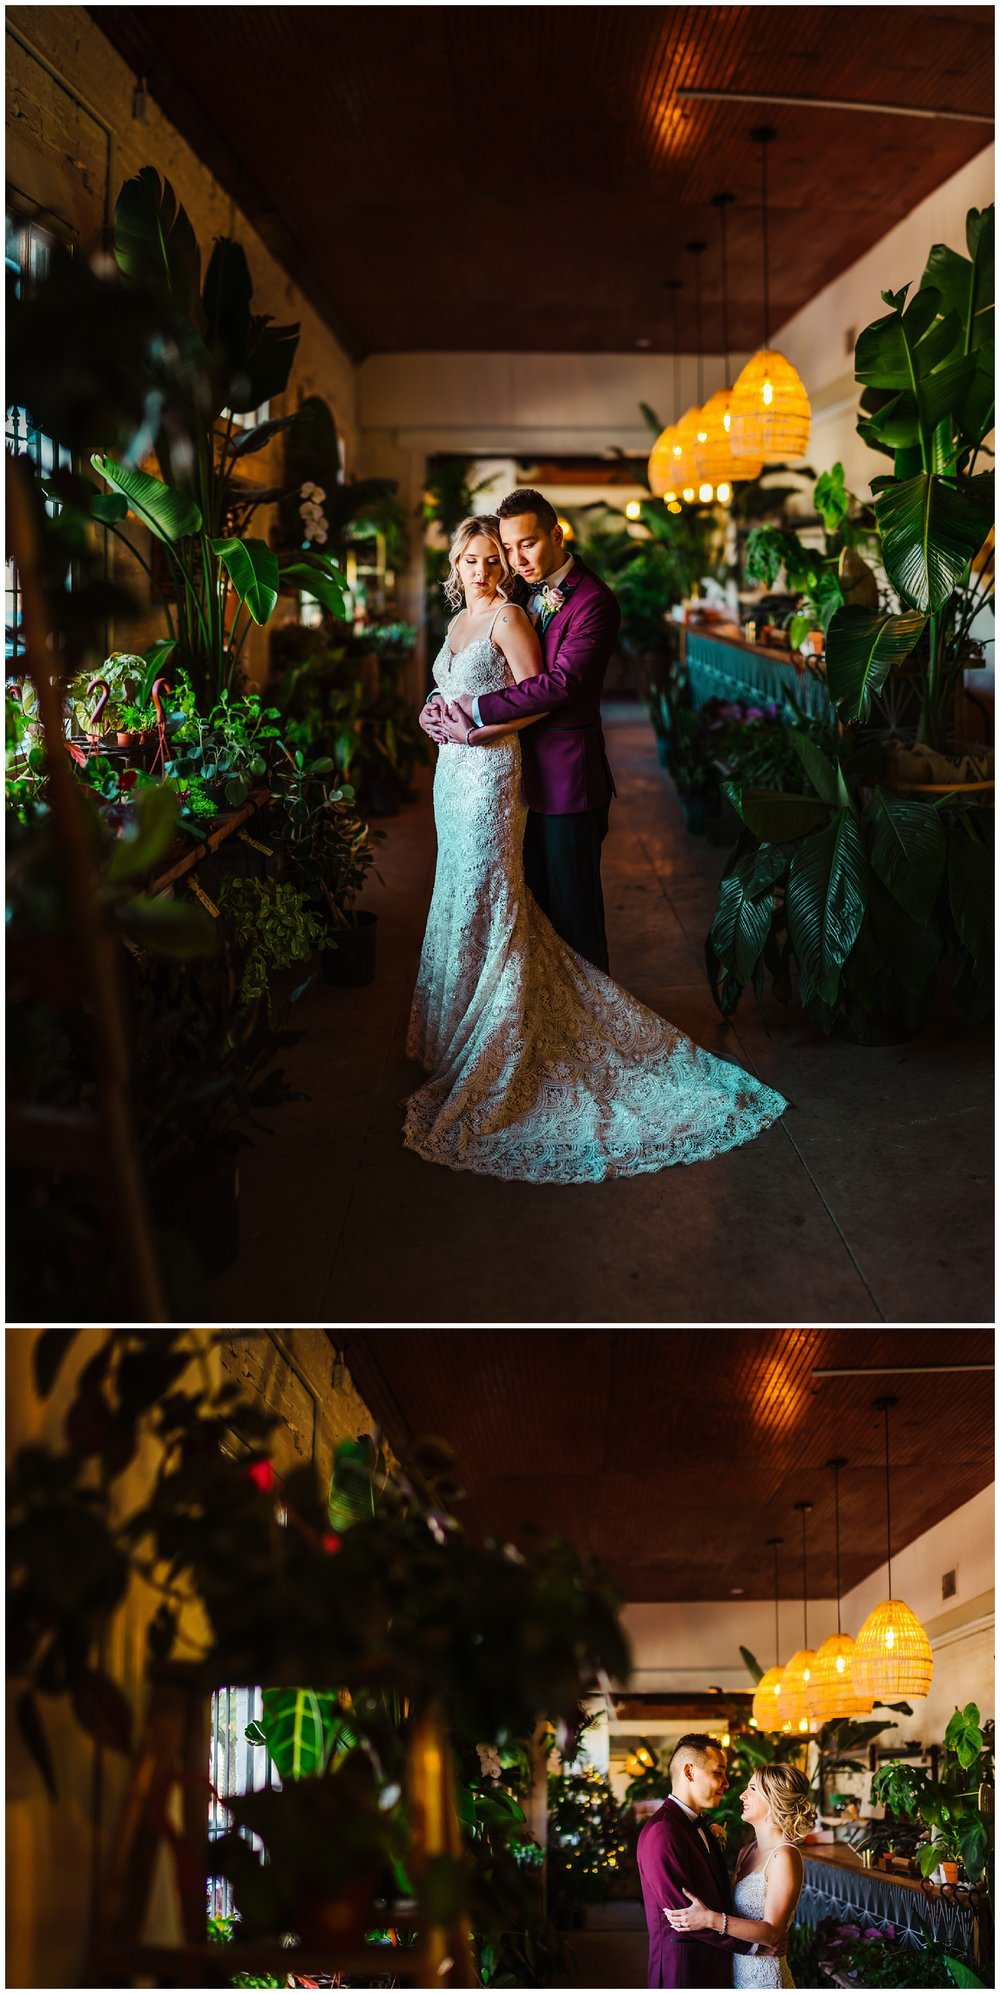 tampa-armeture-wedding-photographer-edgy-industrial-downtown-fancy-free-nursery-tattoo-burgandy-velvet_0029.jpg